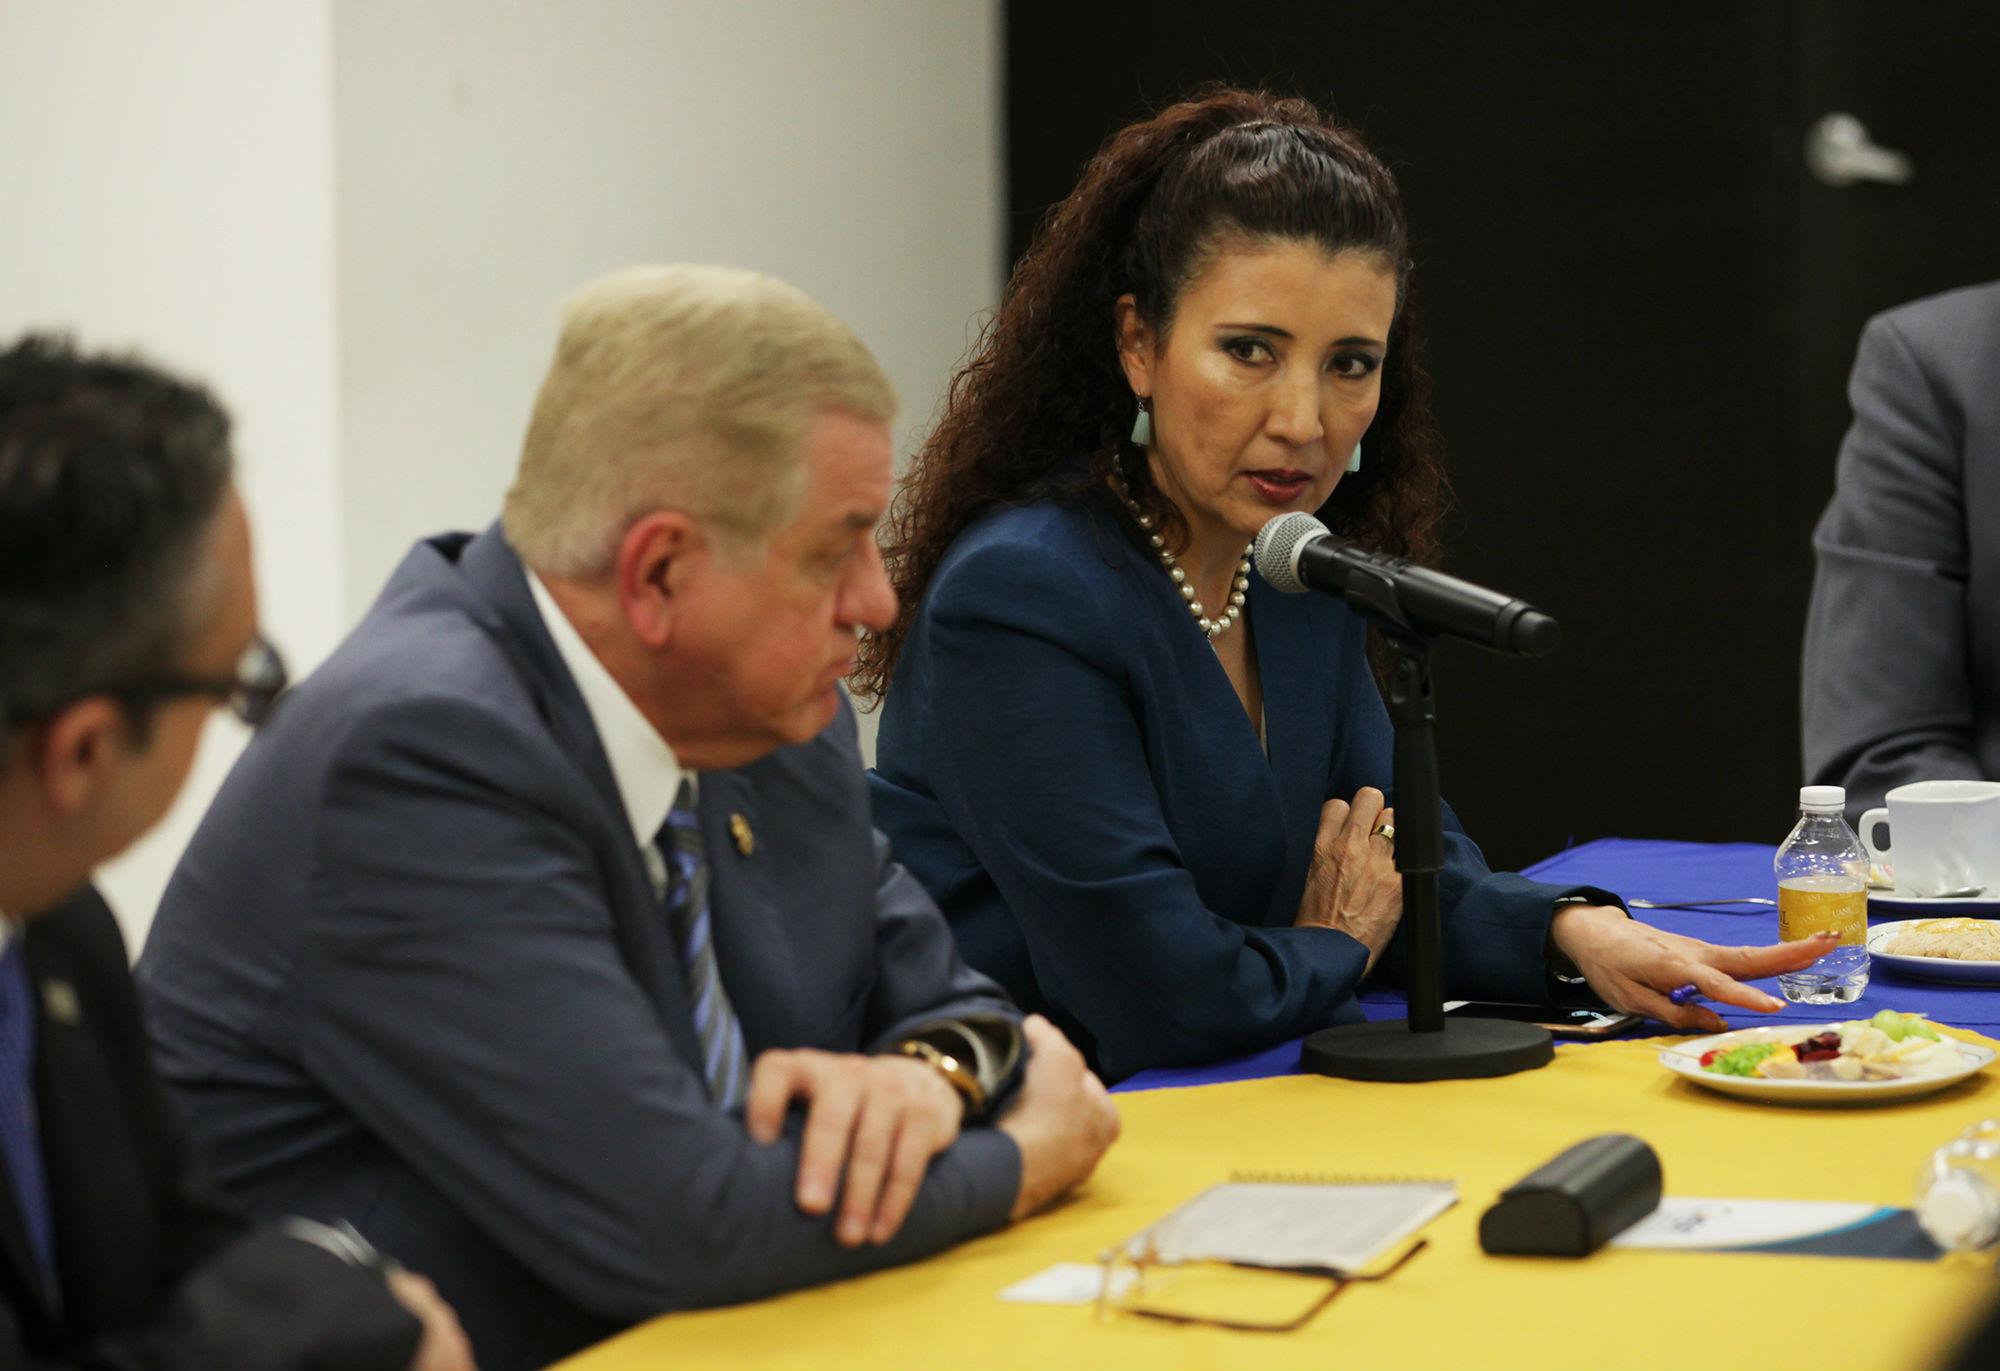 Dra. Luz Natalia Berrún Castañón, de la OMENT